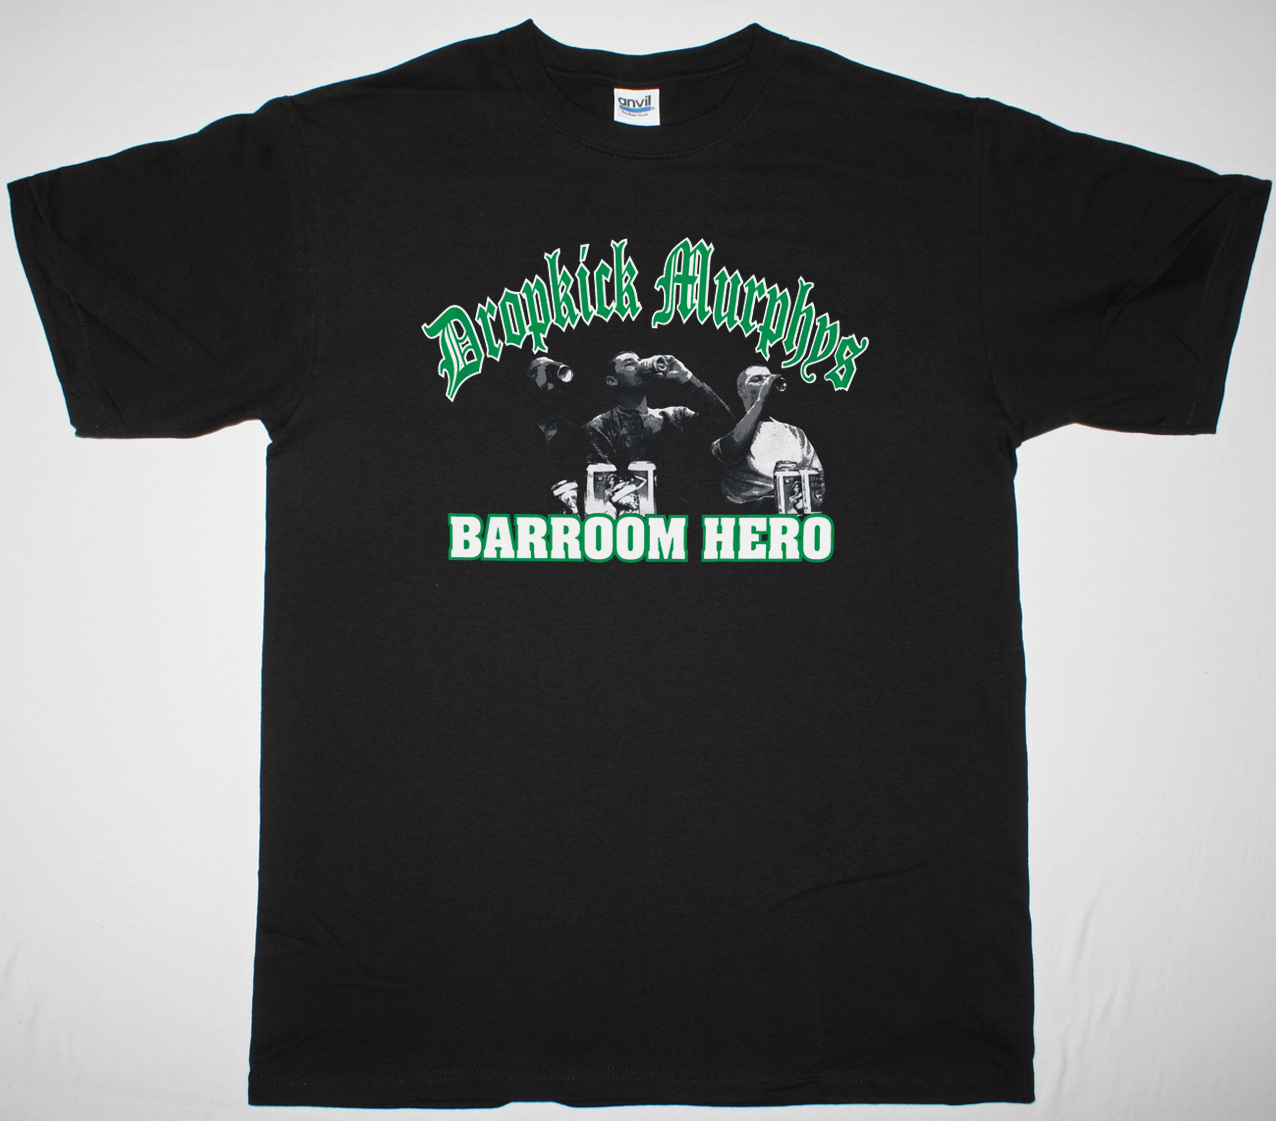 DROPKICK MURPHYS BARROOM HERO NEW BLACK T-SHIRT